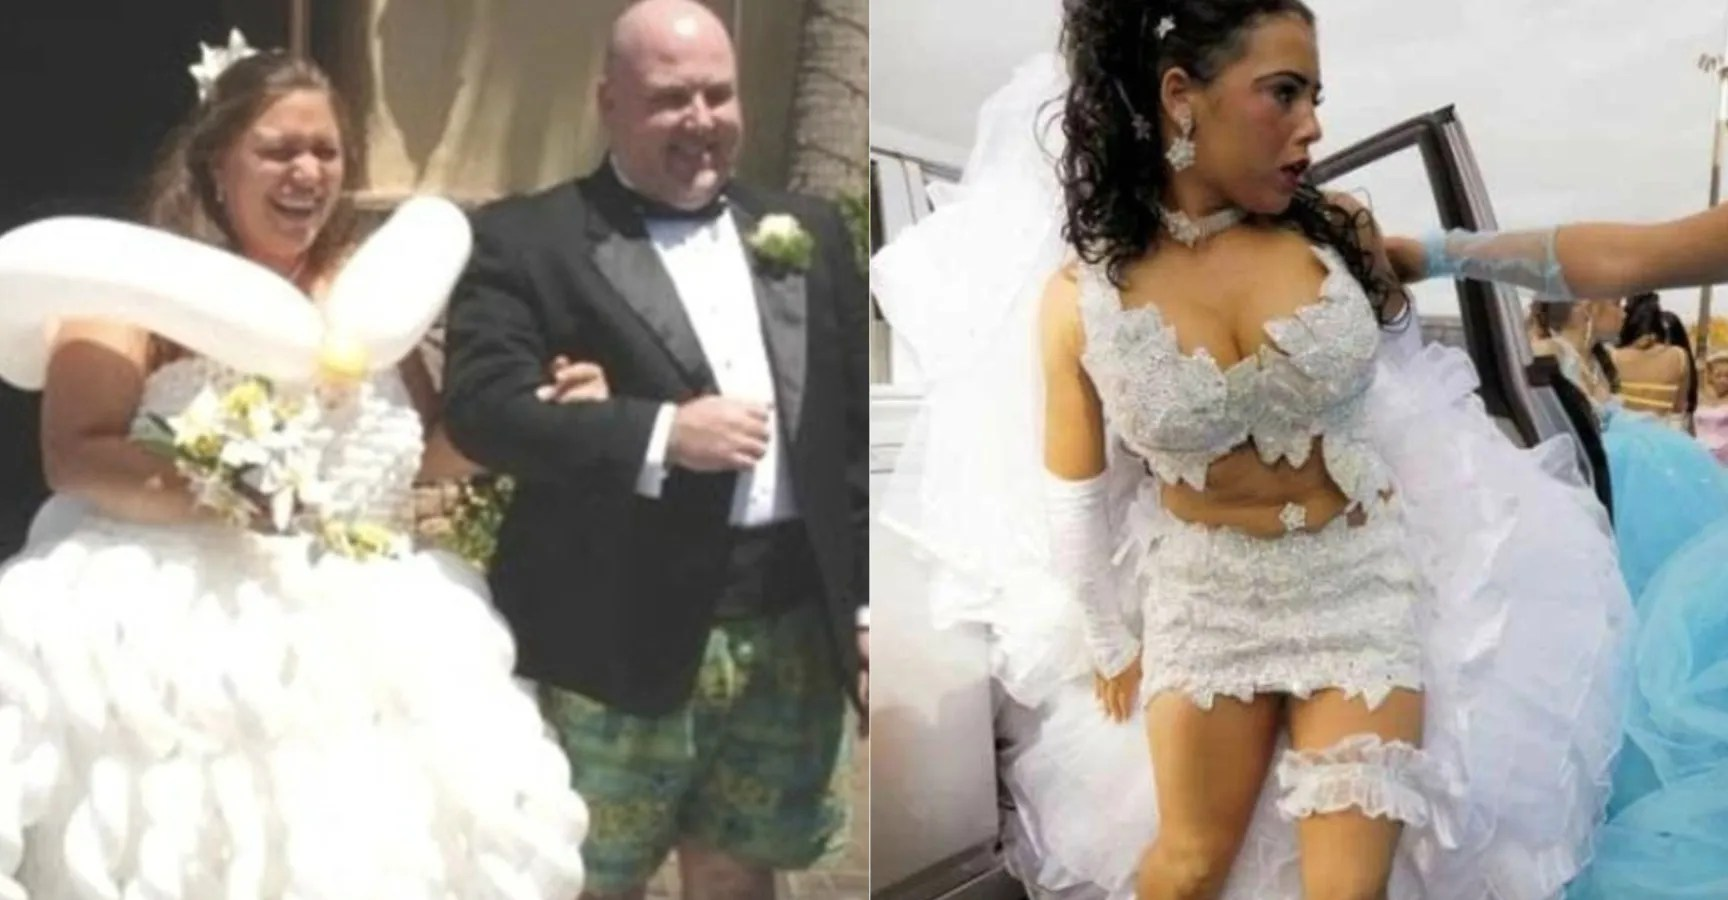 Walking Down The Isle (Of Shame): 15 Hideous Wedding Dress